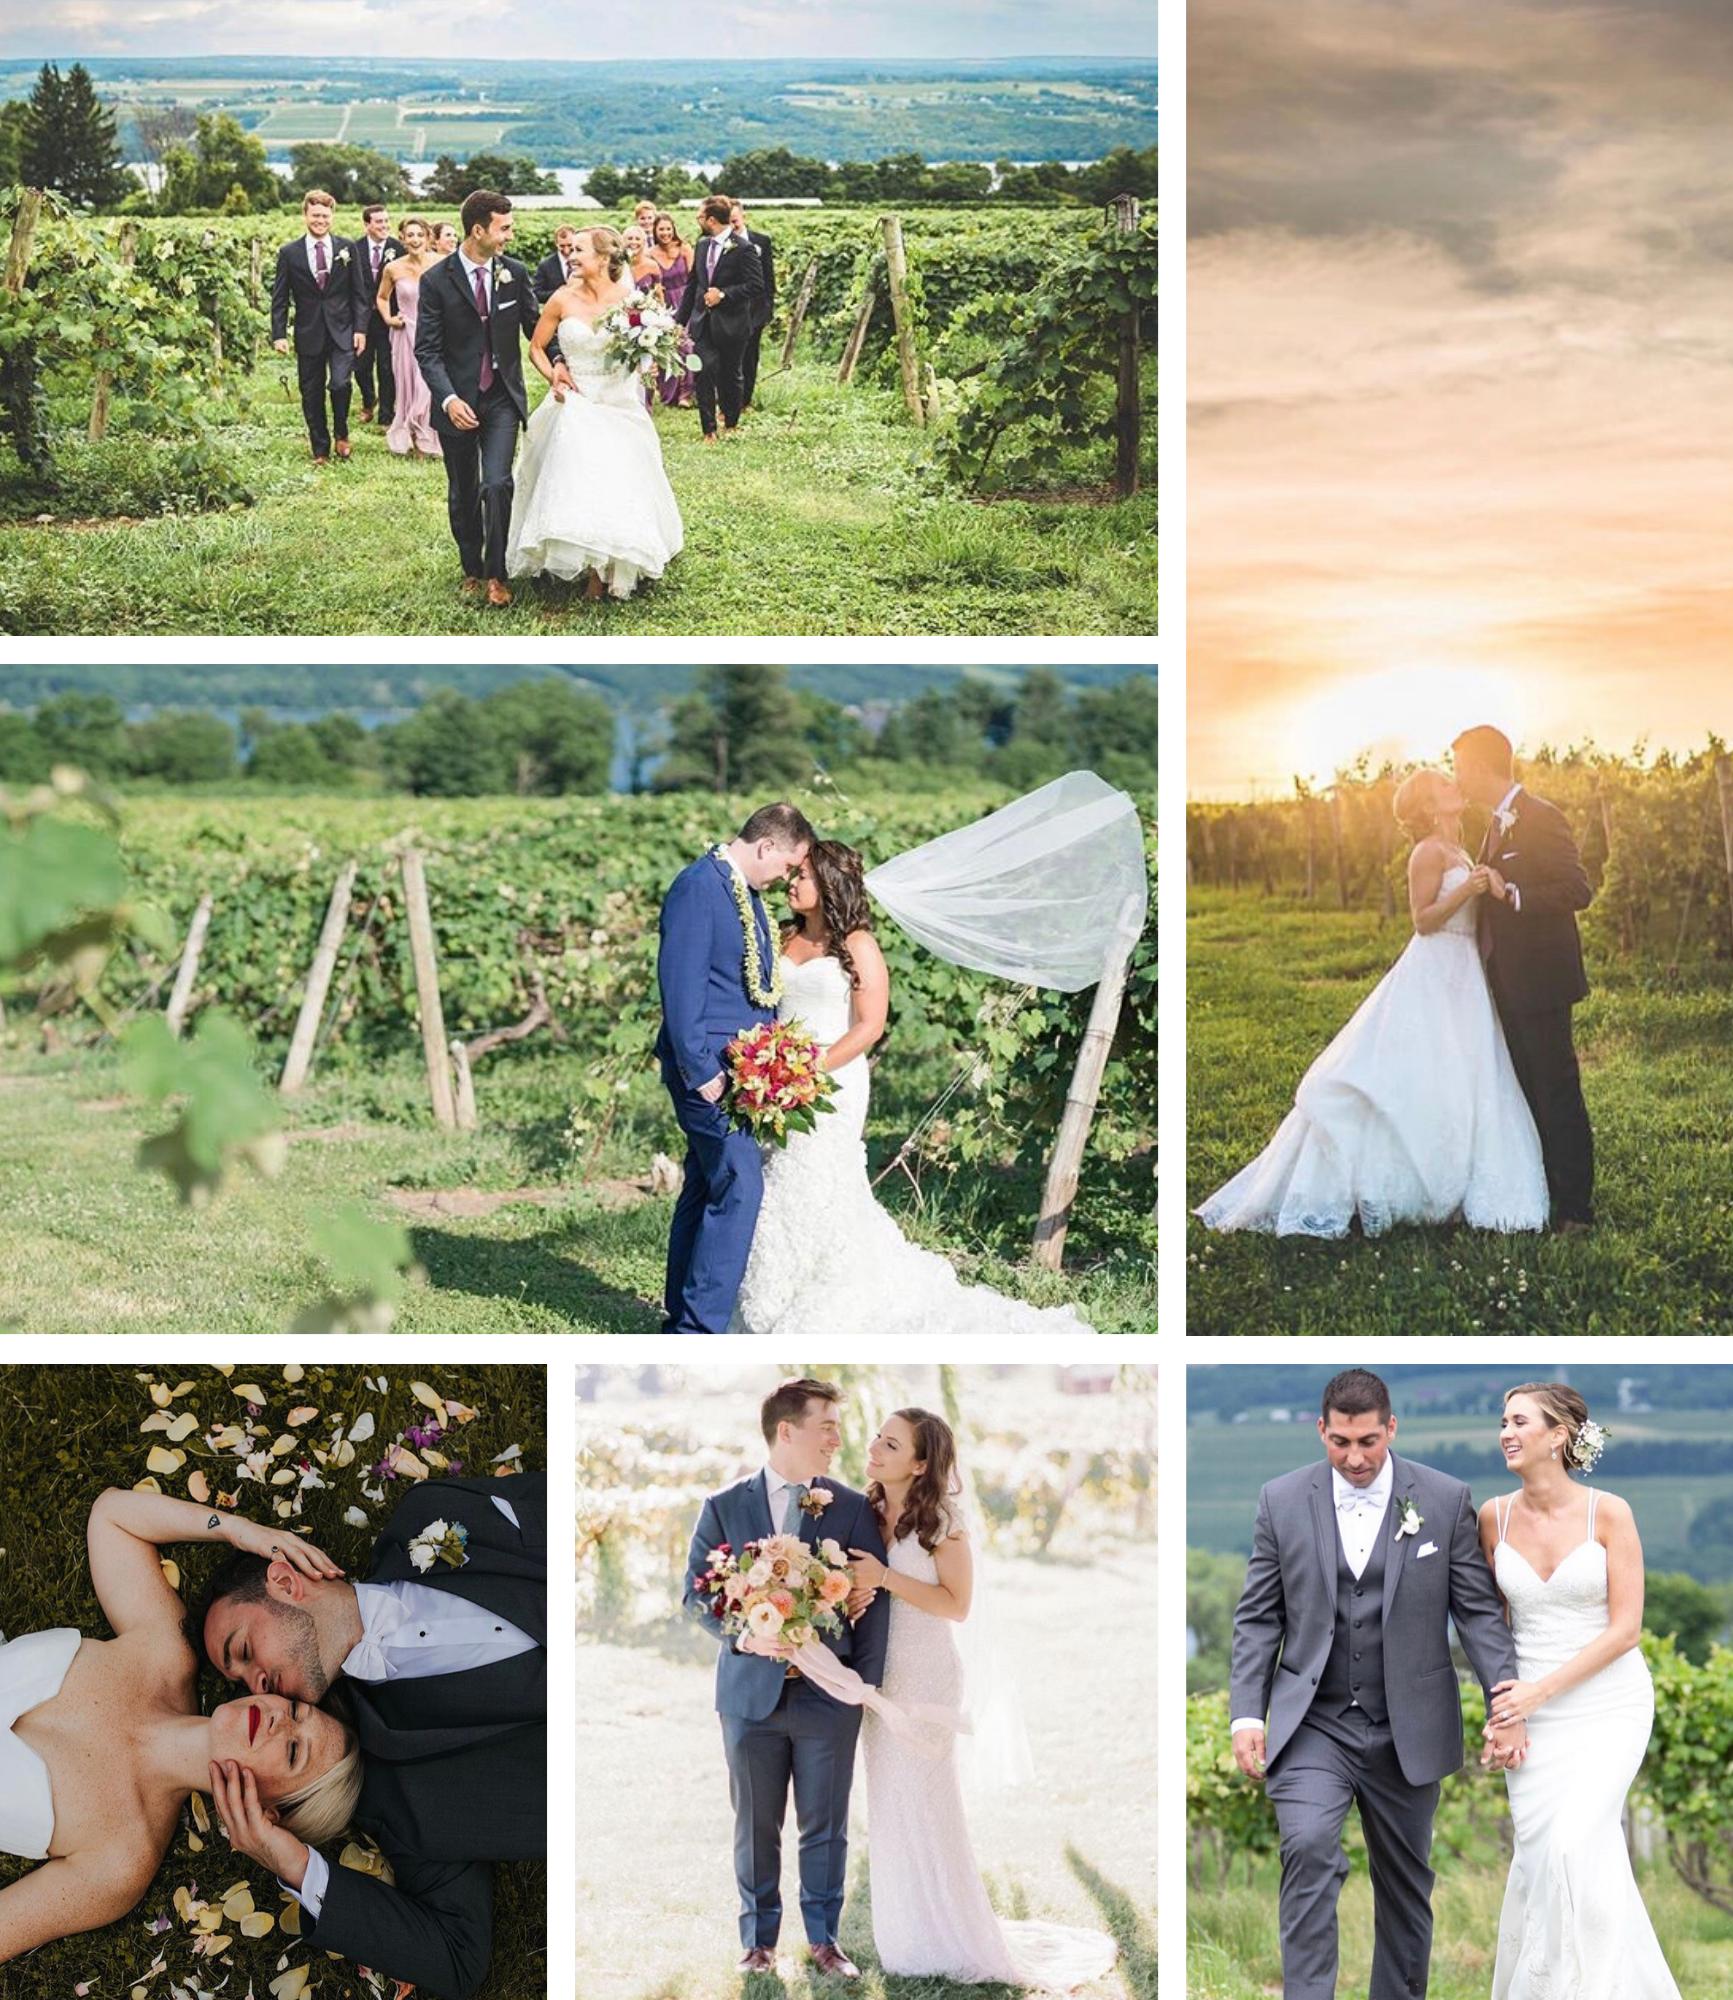 Finger Lakes Weddings at Glenora Wine Cellars